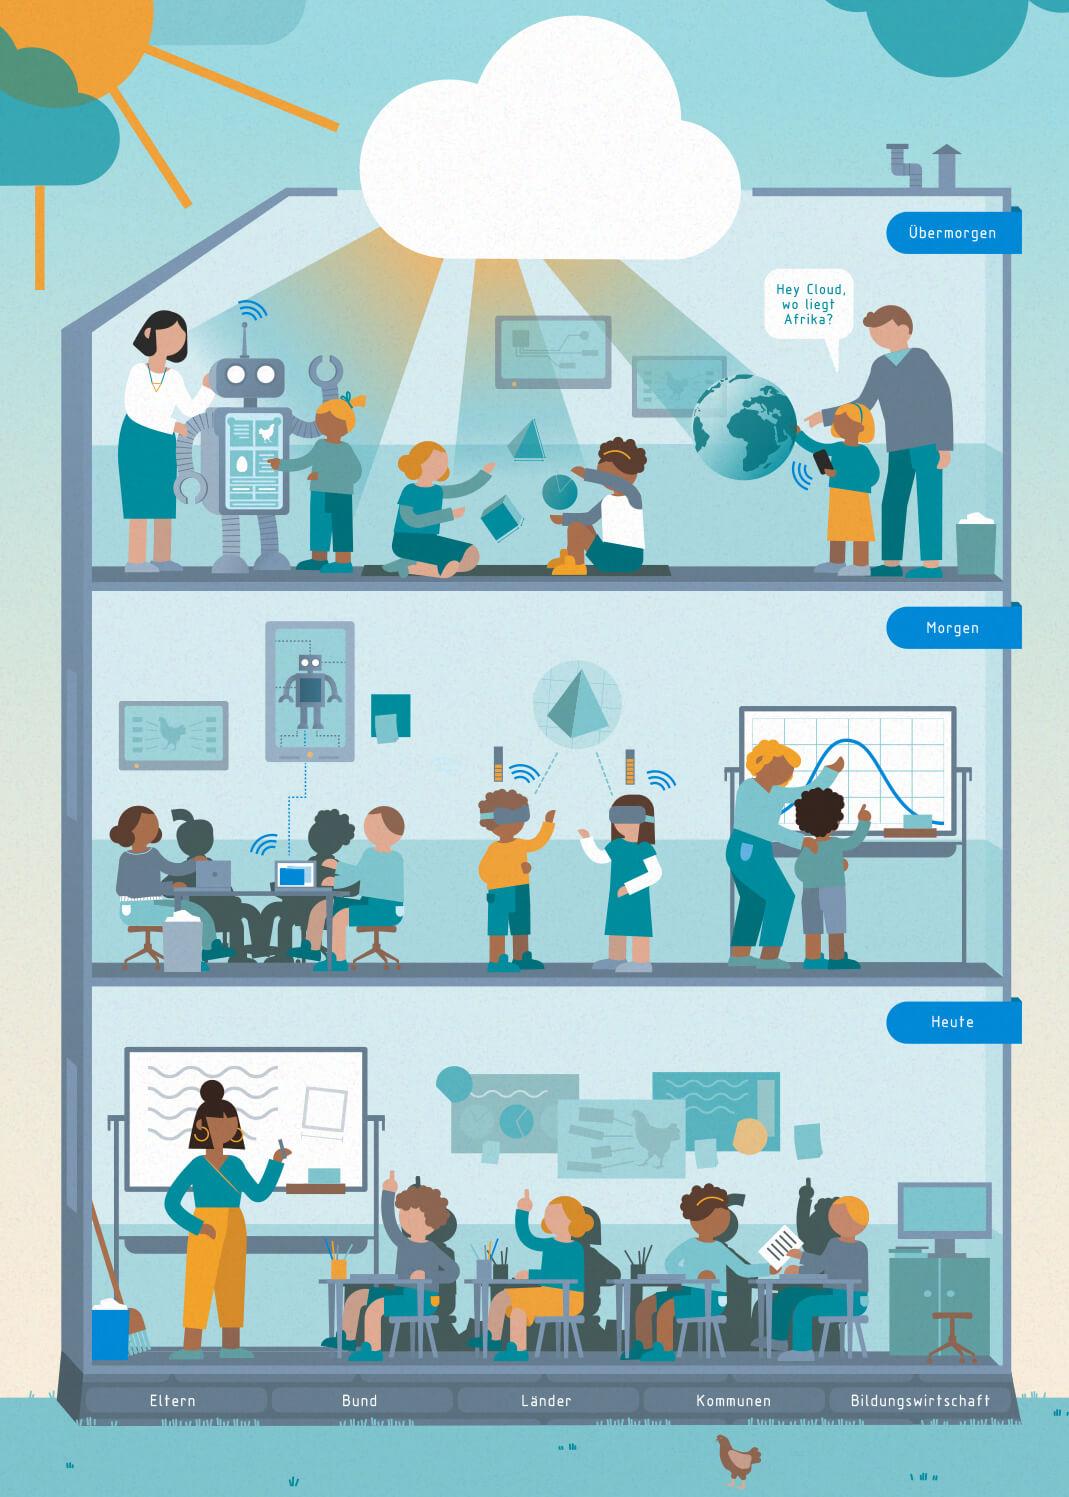 VDI Technologiezentrum Innovation Update Berlin Düsseldorf Plakat Digitale Schule